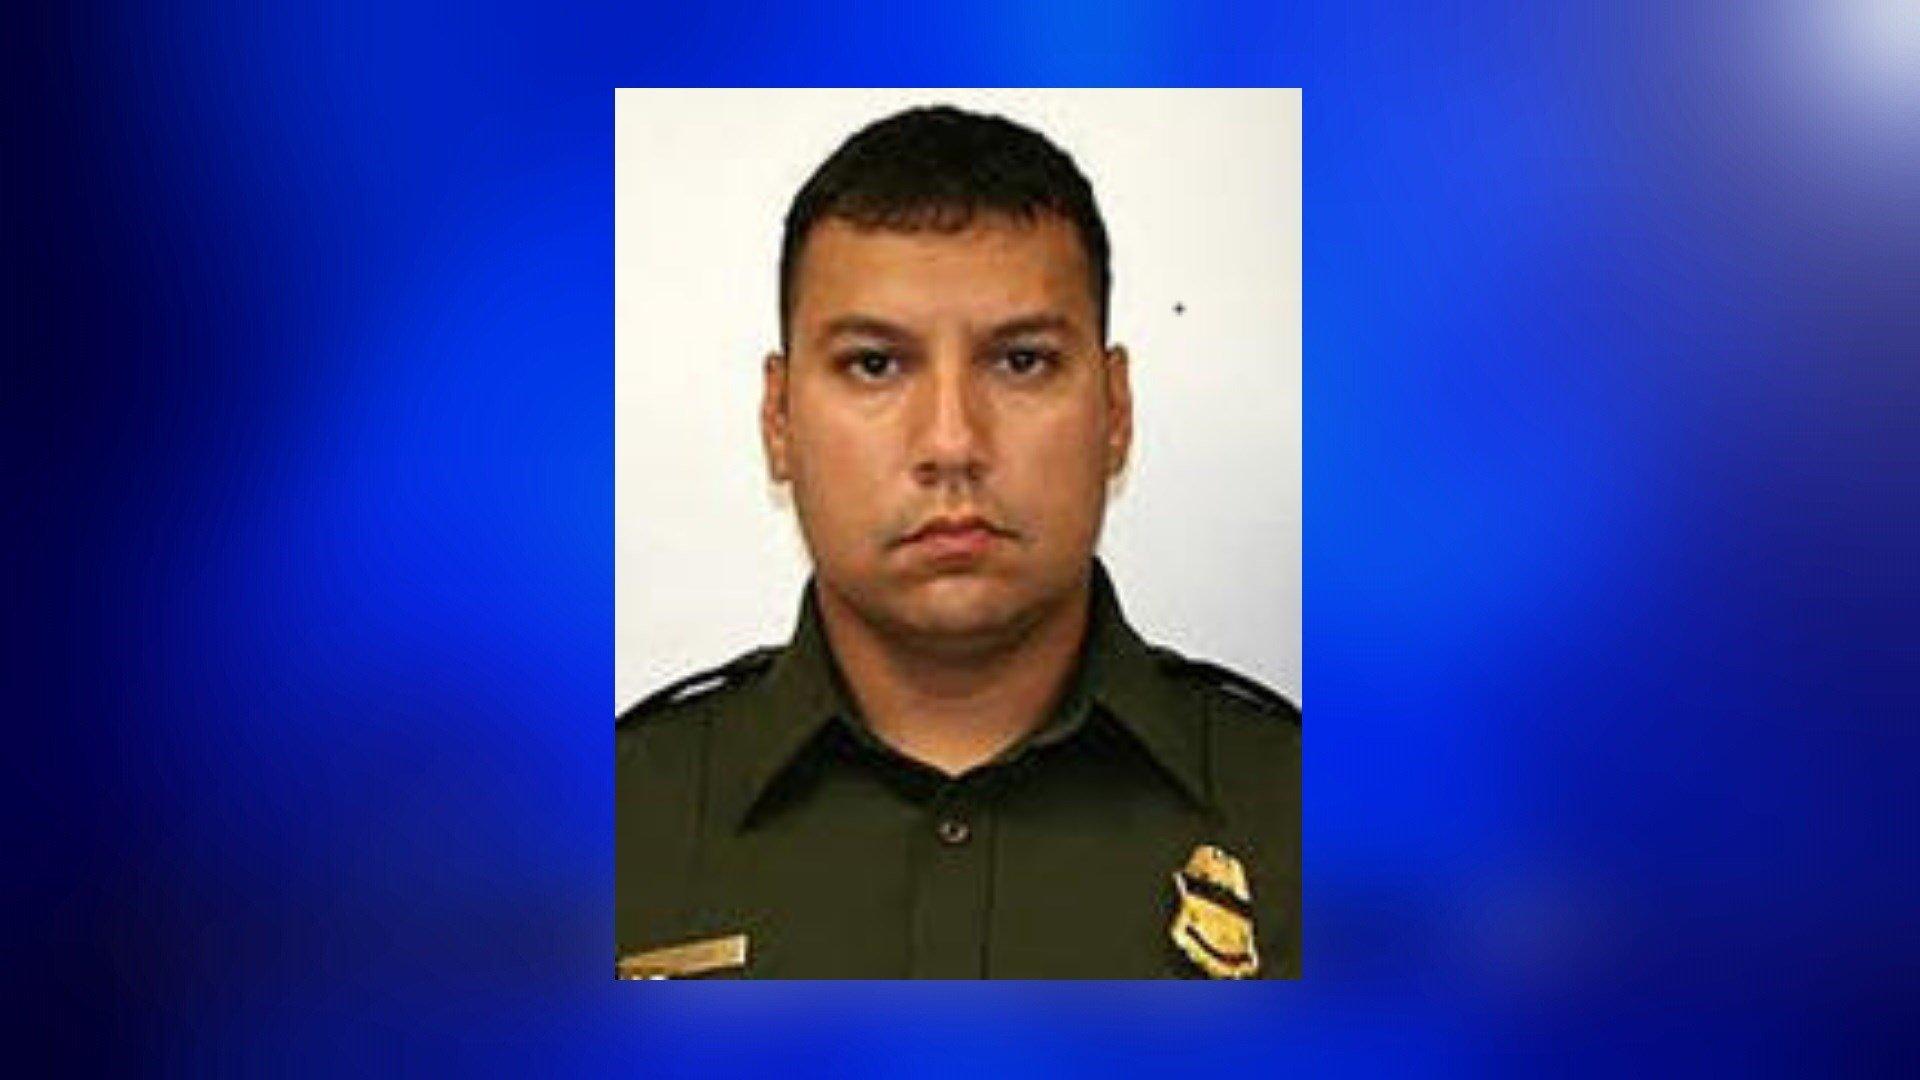 Border Patrol Agent Javier Vega Jr